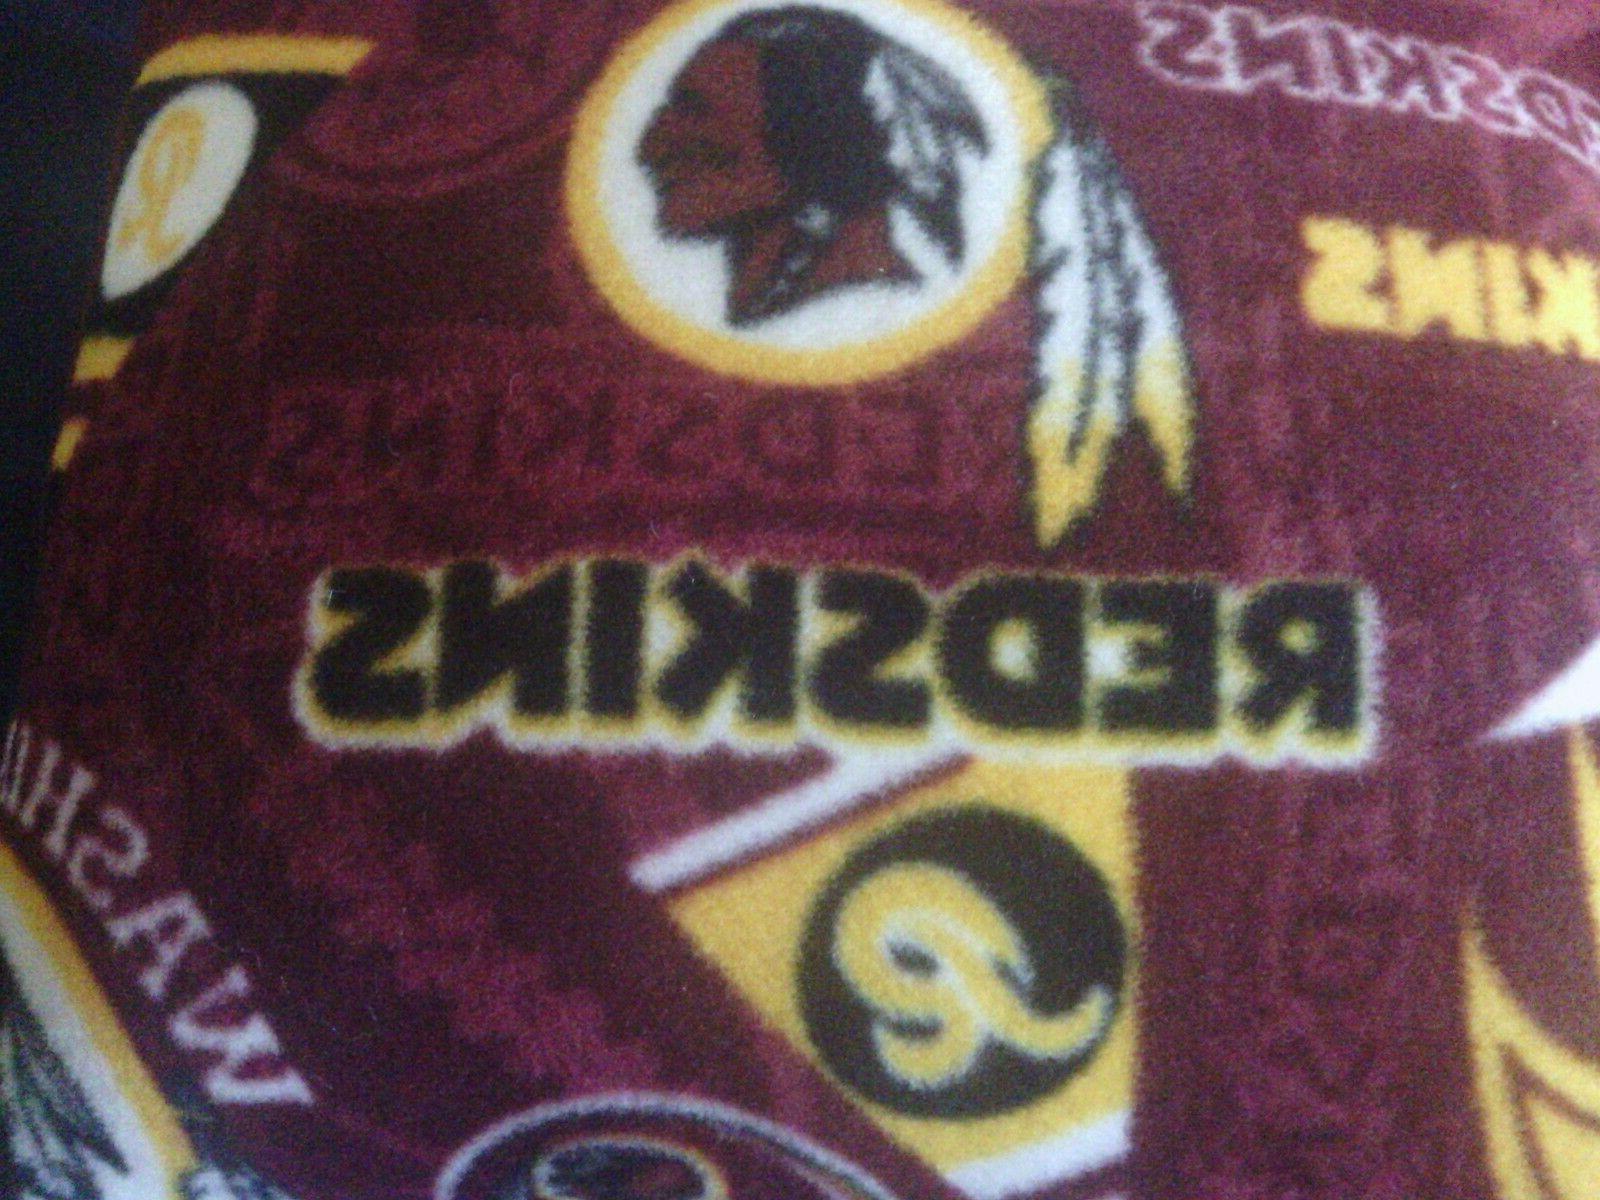 Fleece And 2 Pillow Redskins